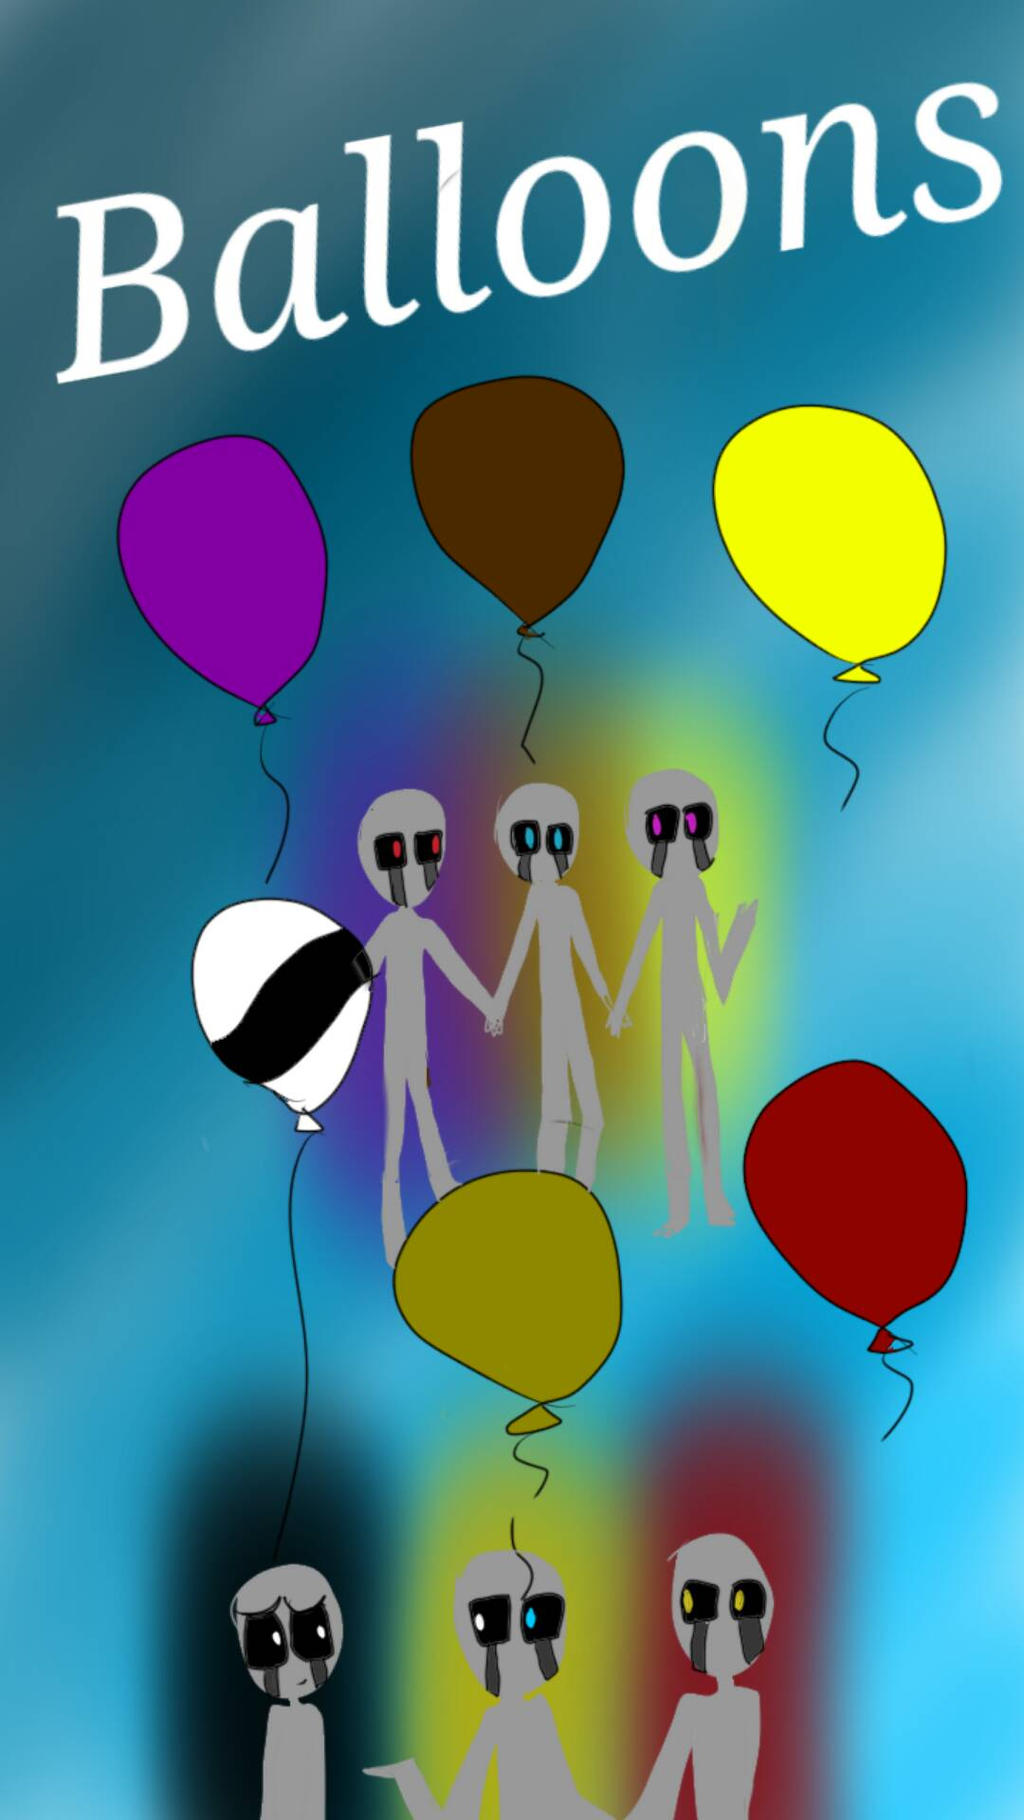 Fnaf balloons by mandopony by melissatheartist99 on deviantart